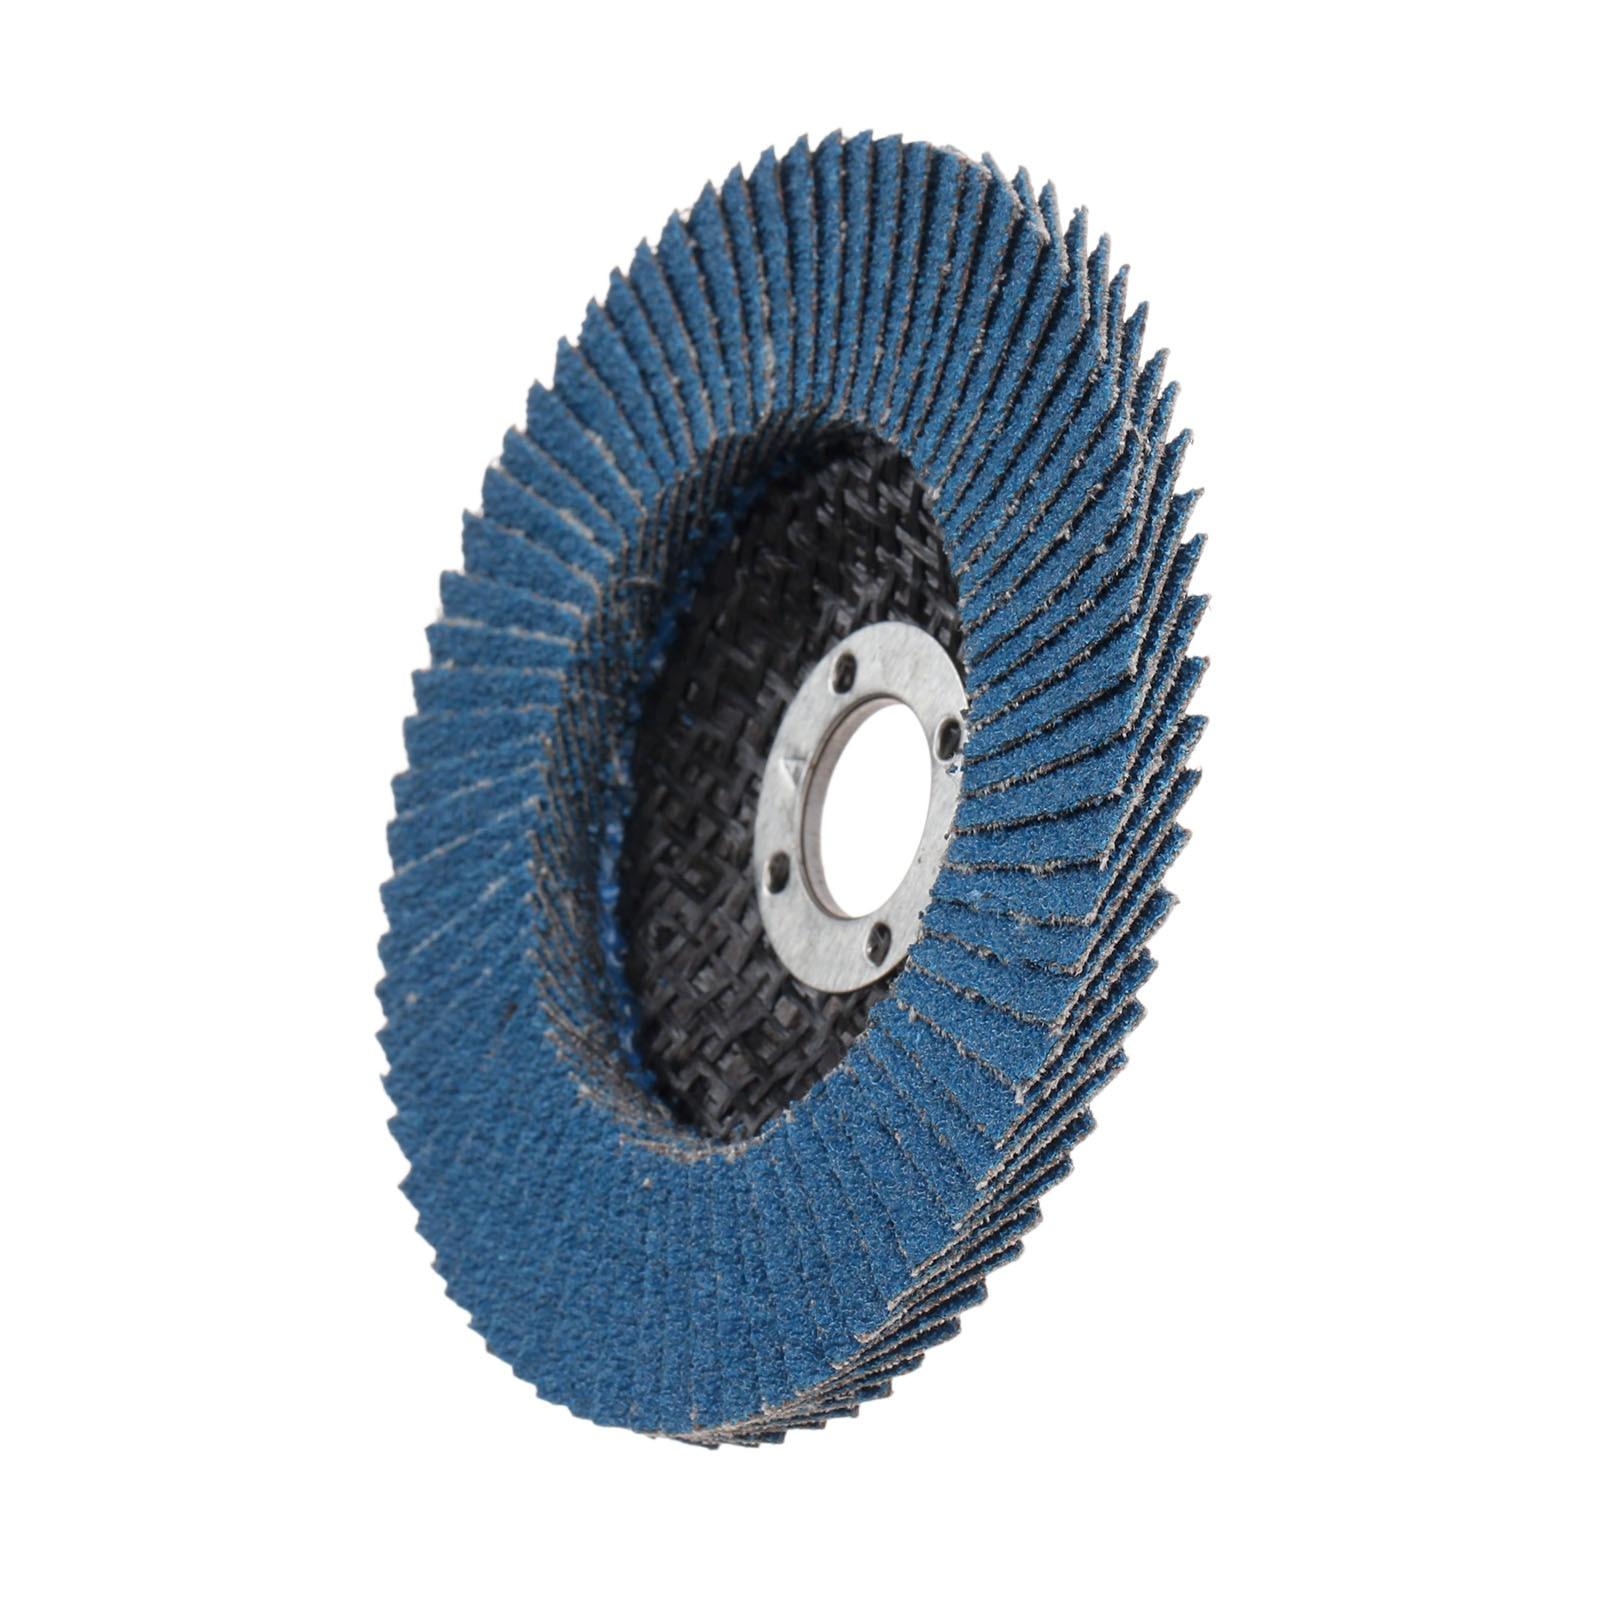 DRELD 100mm Grinding Wheel Flap Discs Dremel Accessories Angle Grinder Sanding Discs Abrasive Tool 80 Grit Blue For Wood Metal